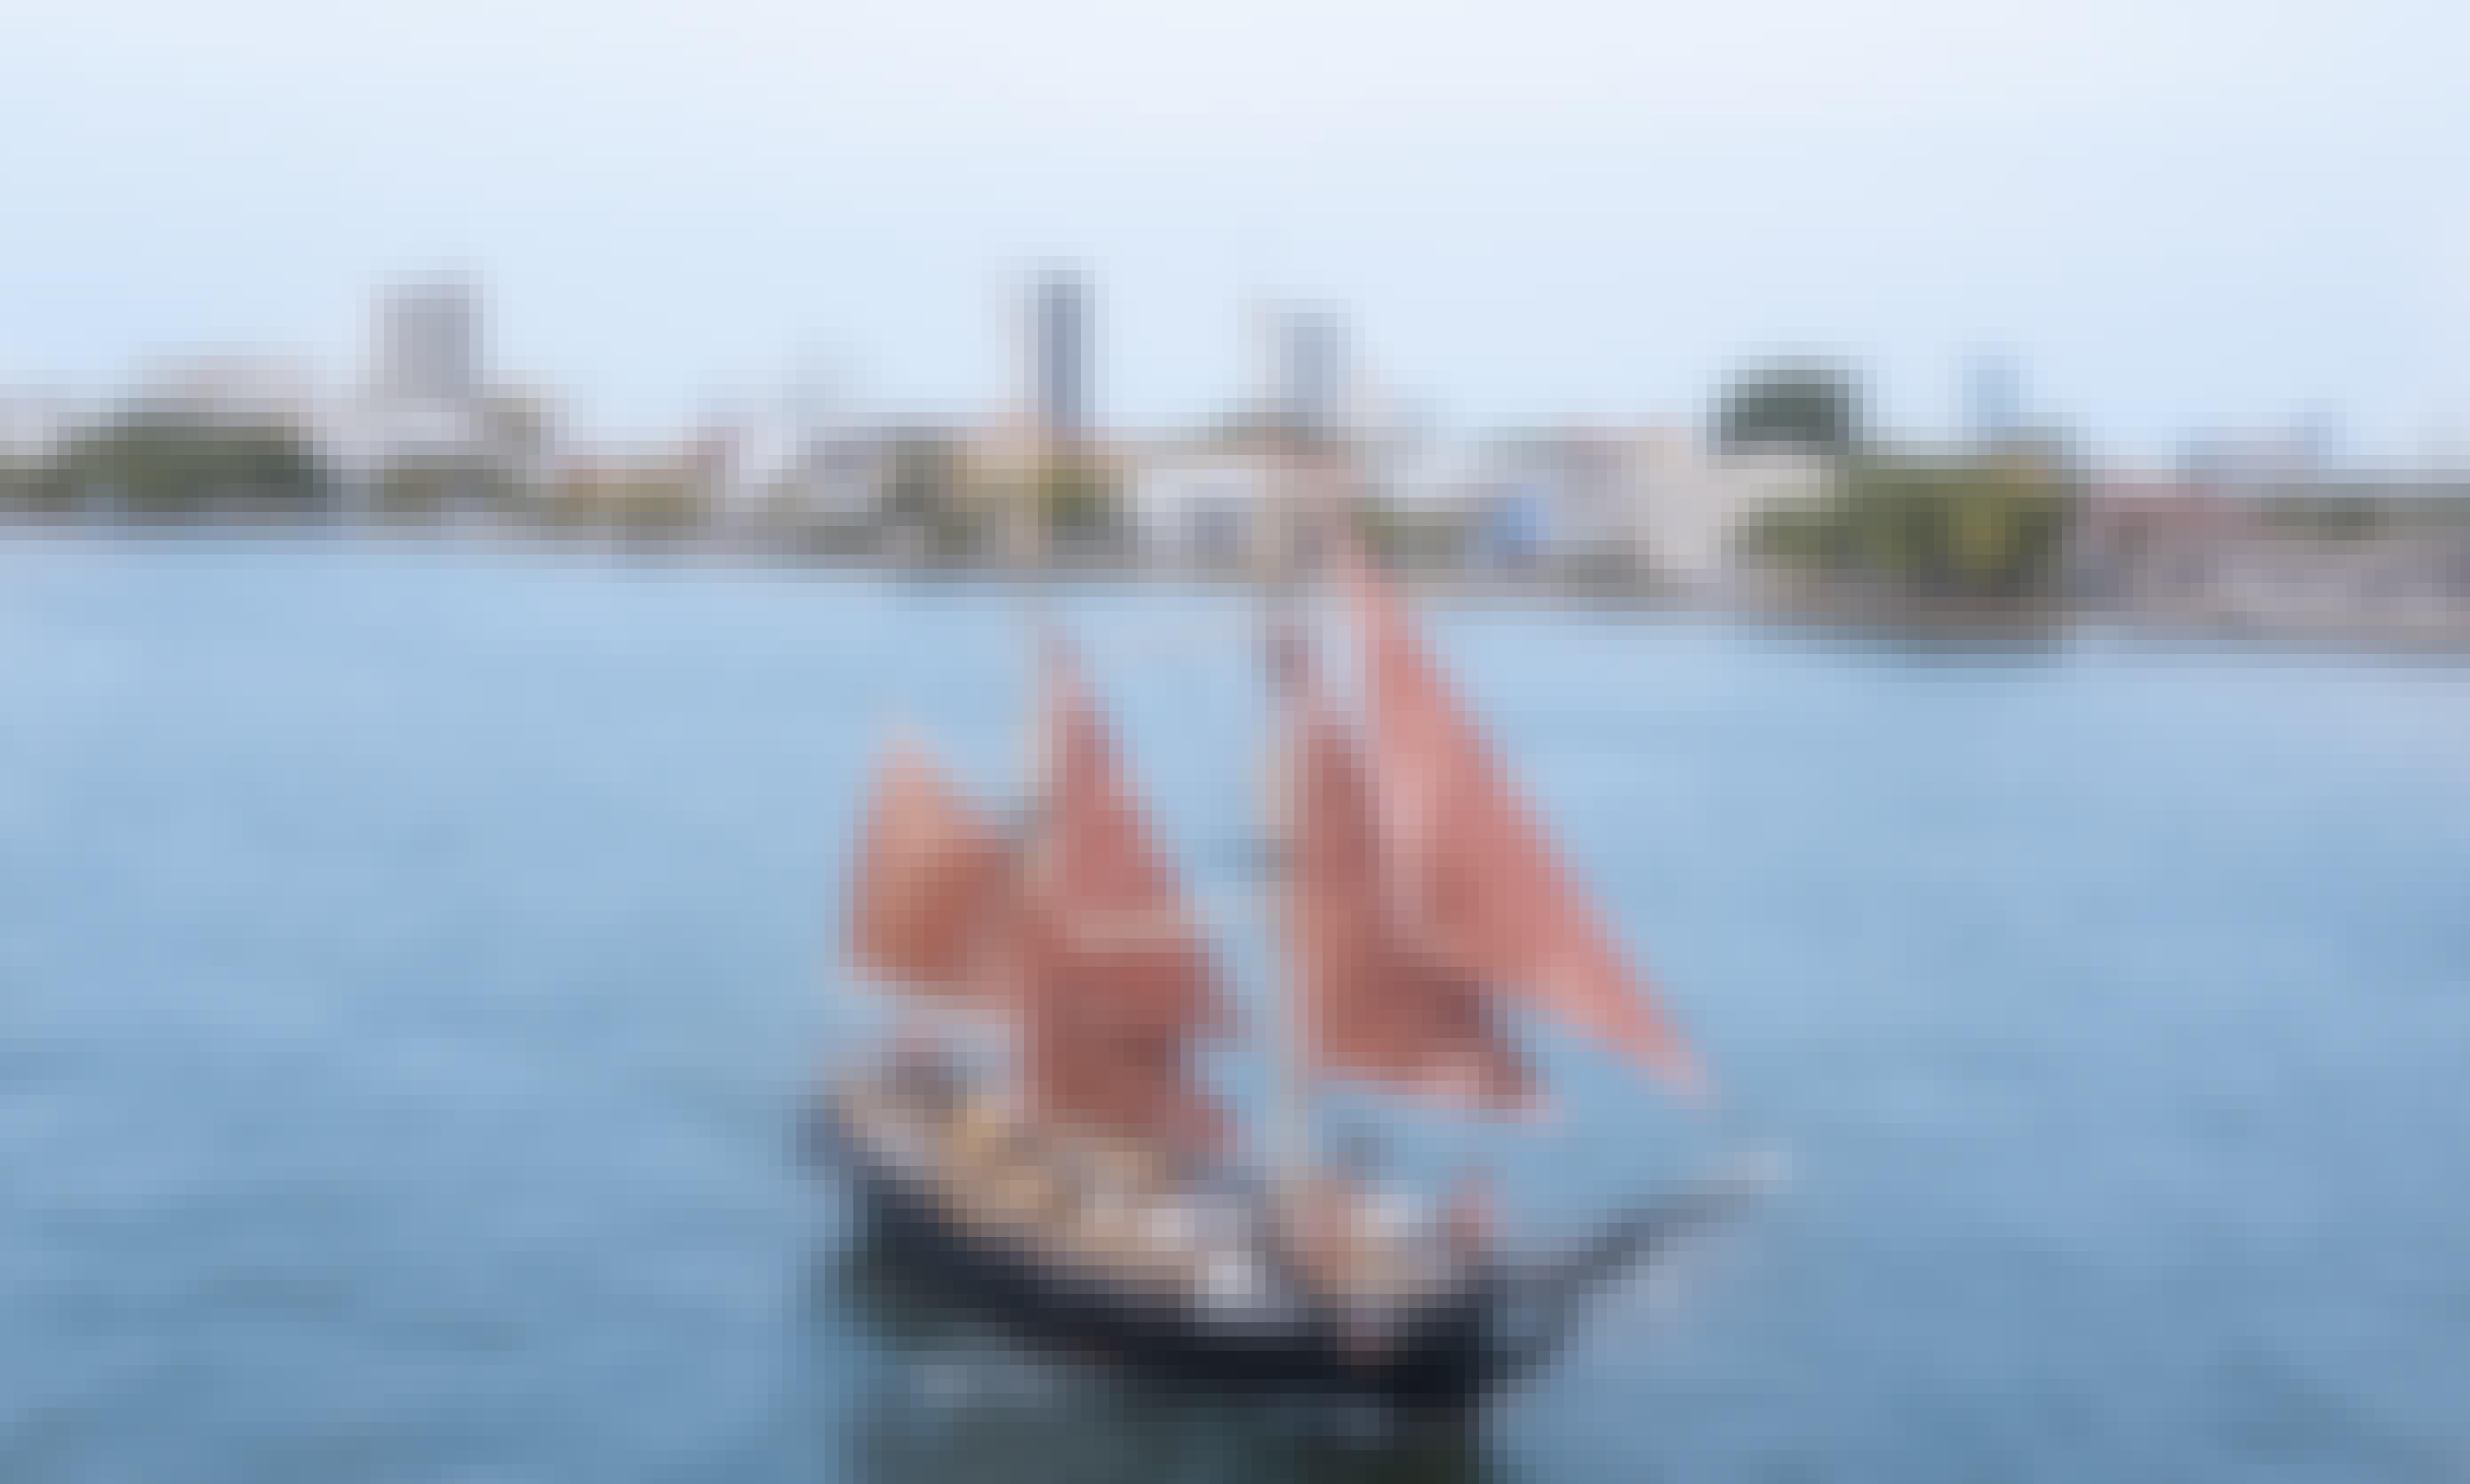 Pirate Ship Sailing Adventure